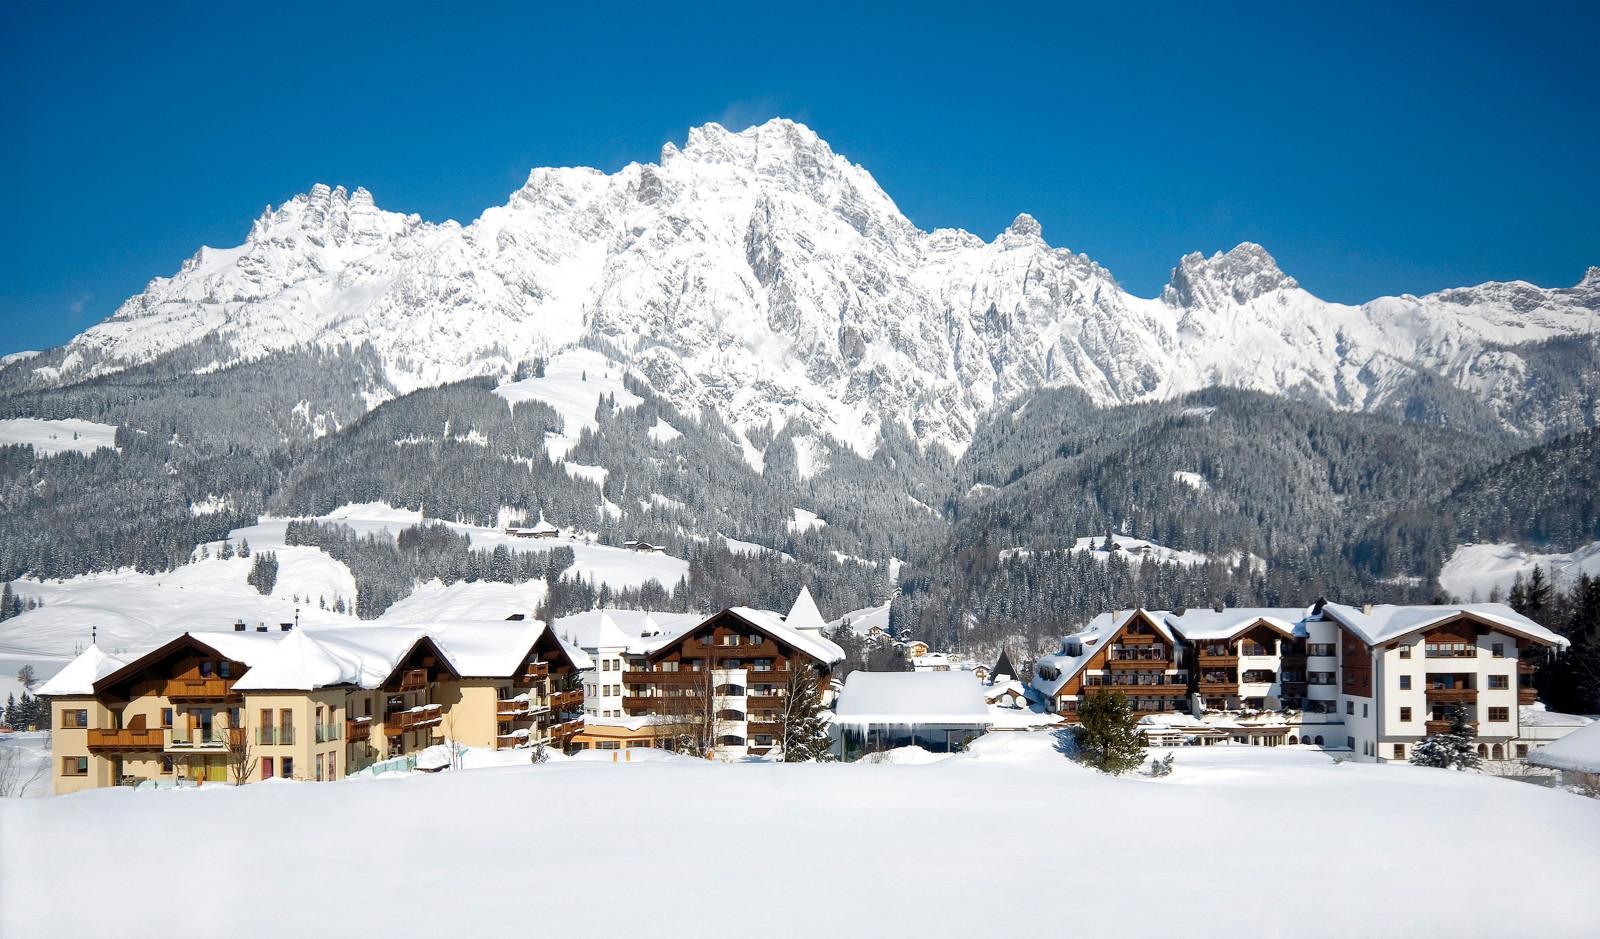 Winterfreuden am Krallerhof